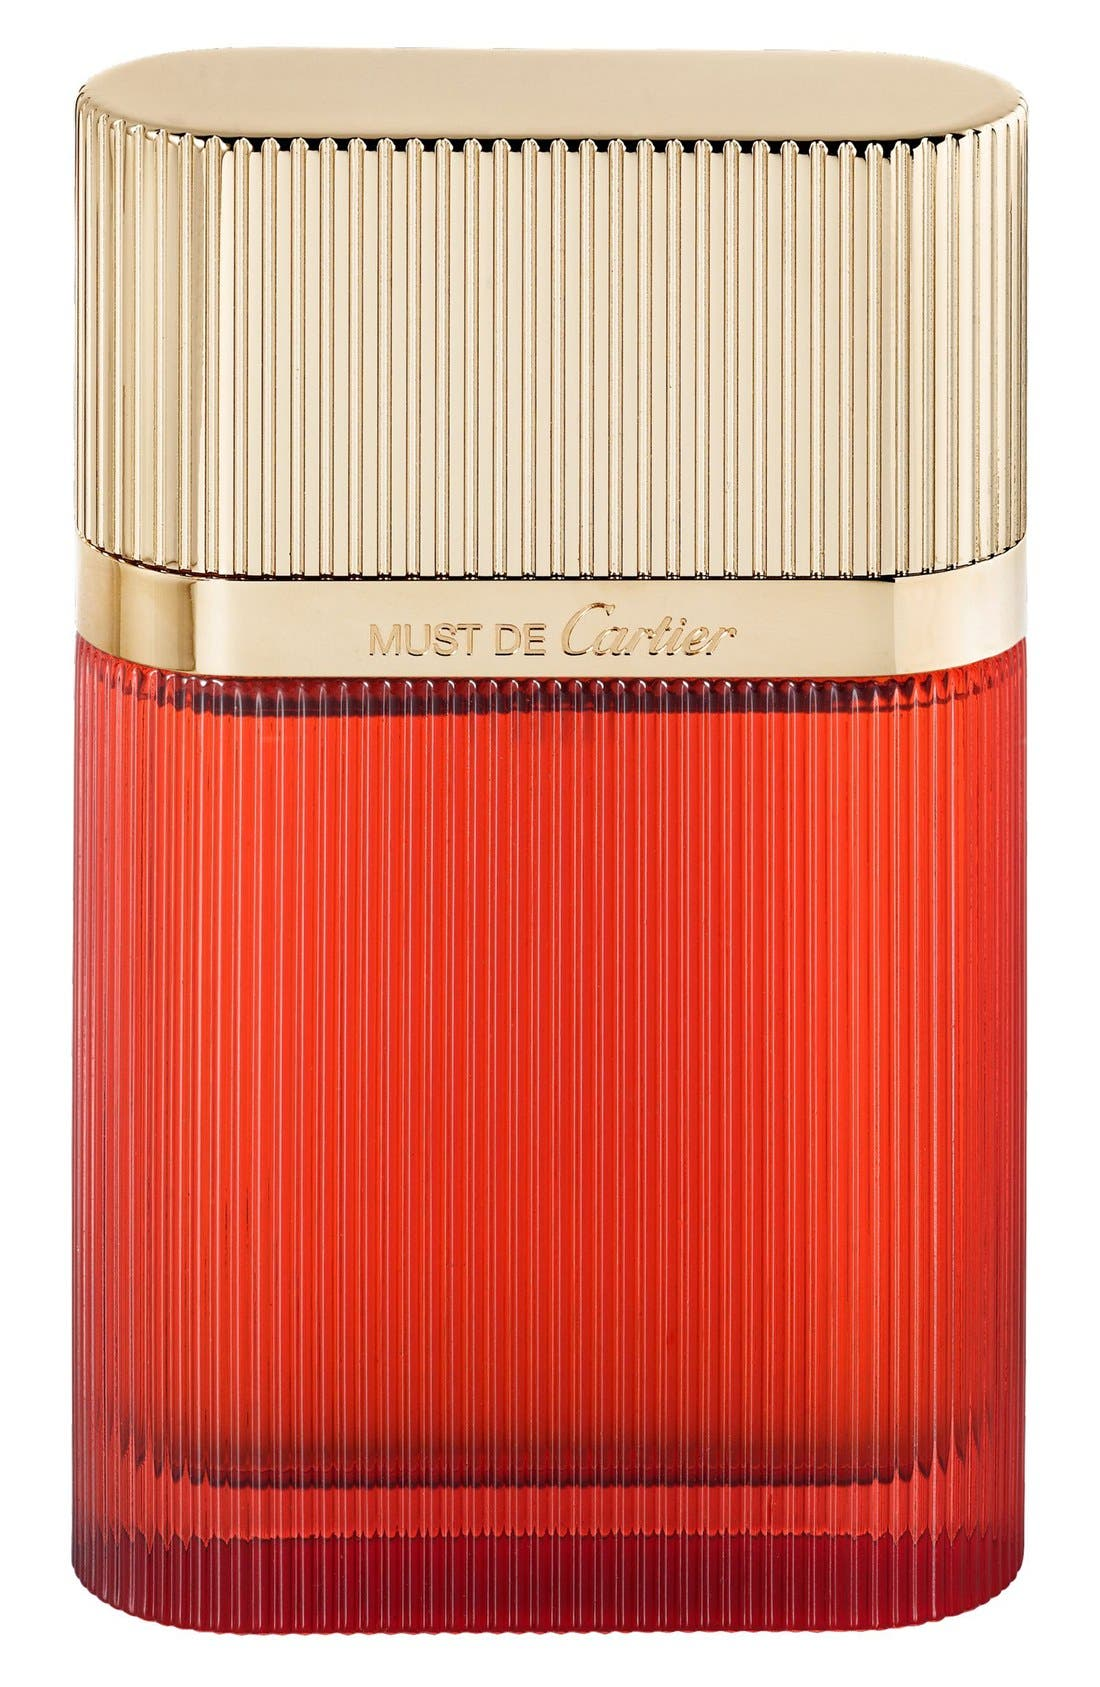 Cartier 'Must de Cartier' Parfum